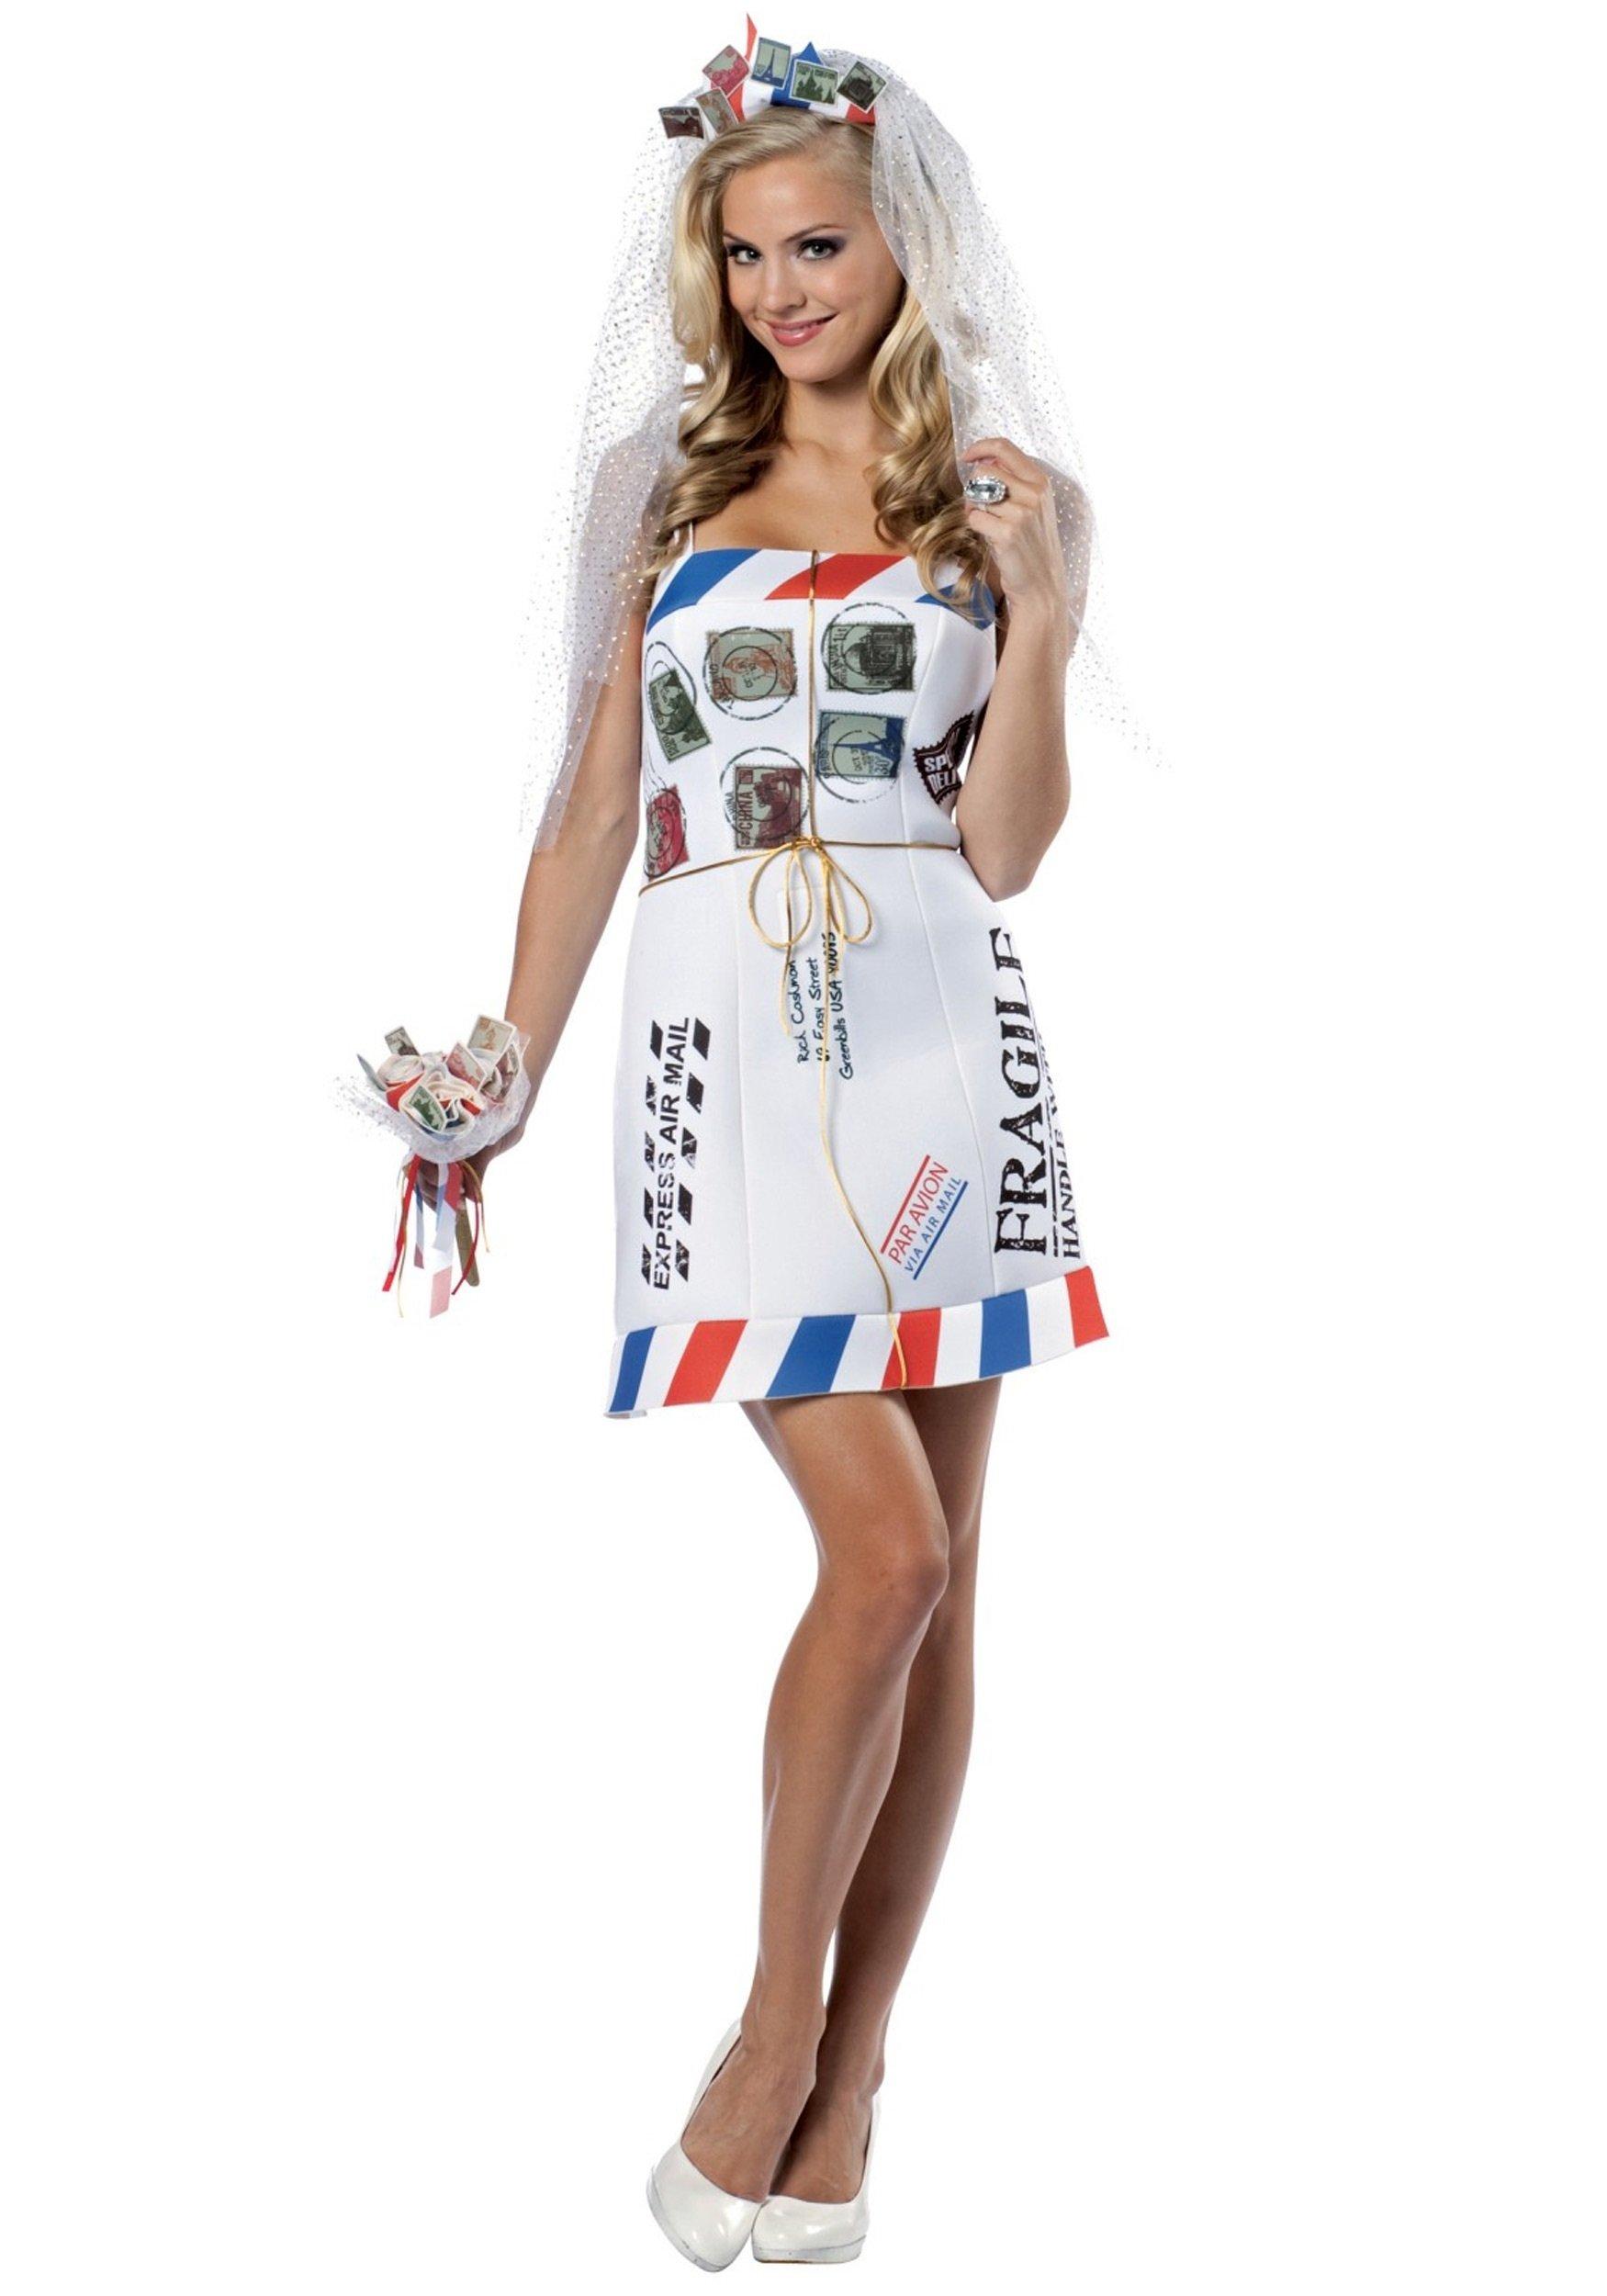 10 Elegant Funny Halloween Costume Ideas Women funny mail order bride costume funny halloween costume ideas for women 4 2020